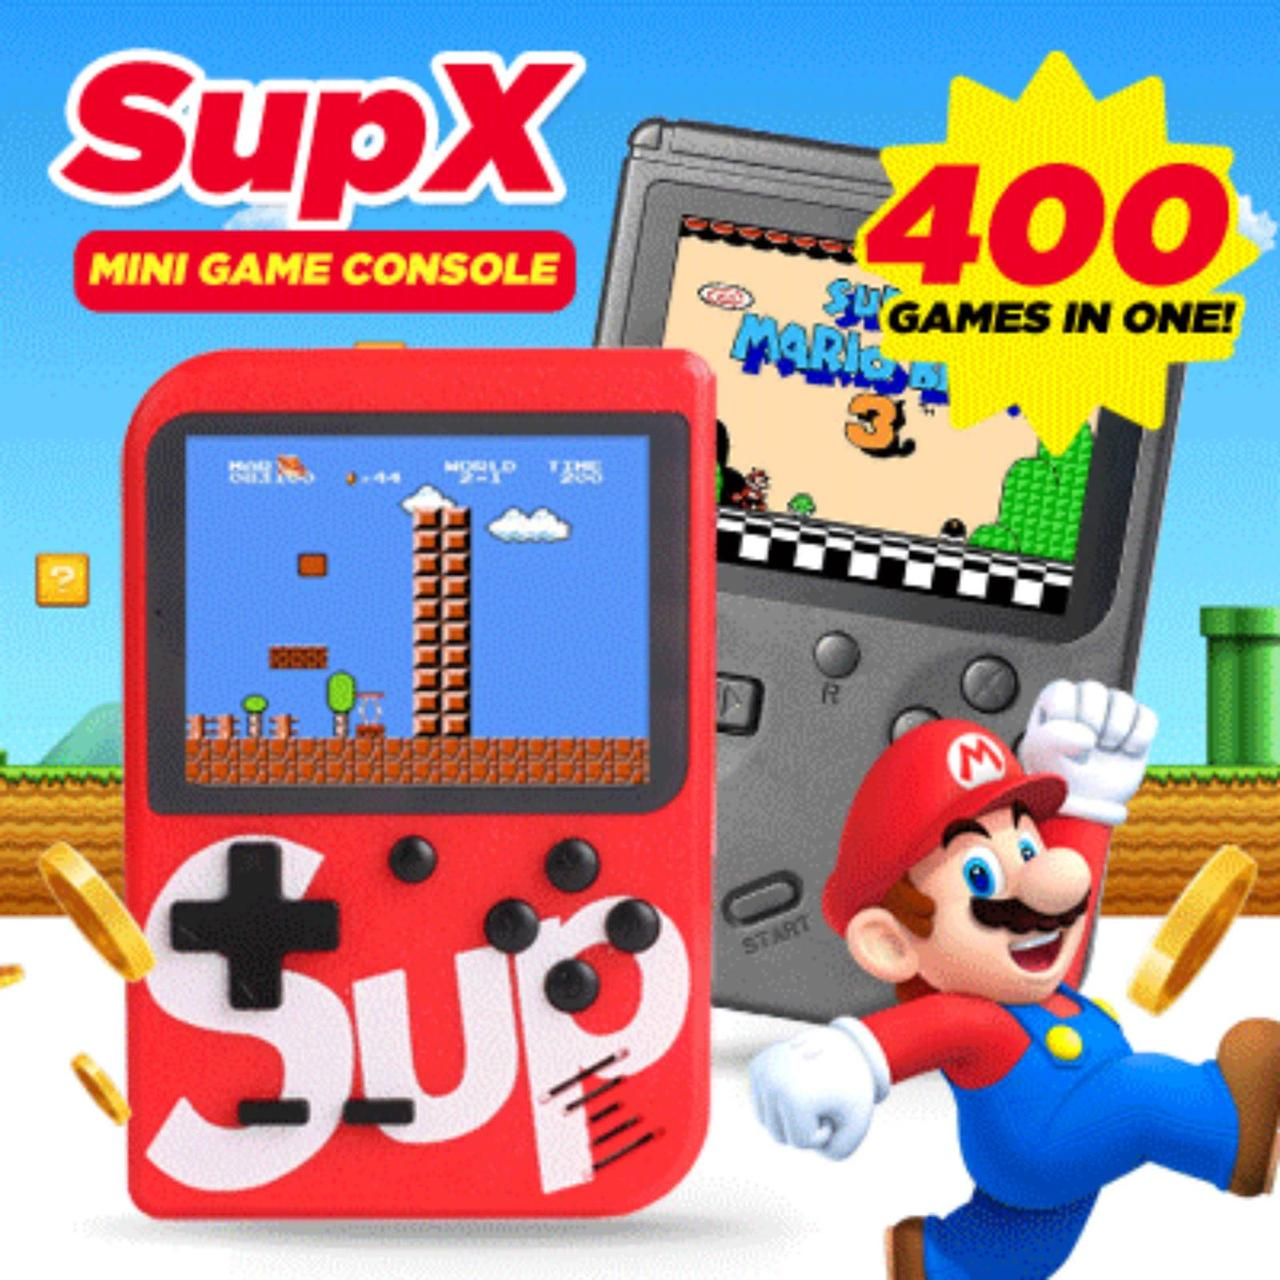 Только опт!!! Игровая приставка SUP Game Box 400 in 1